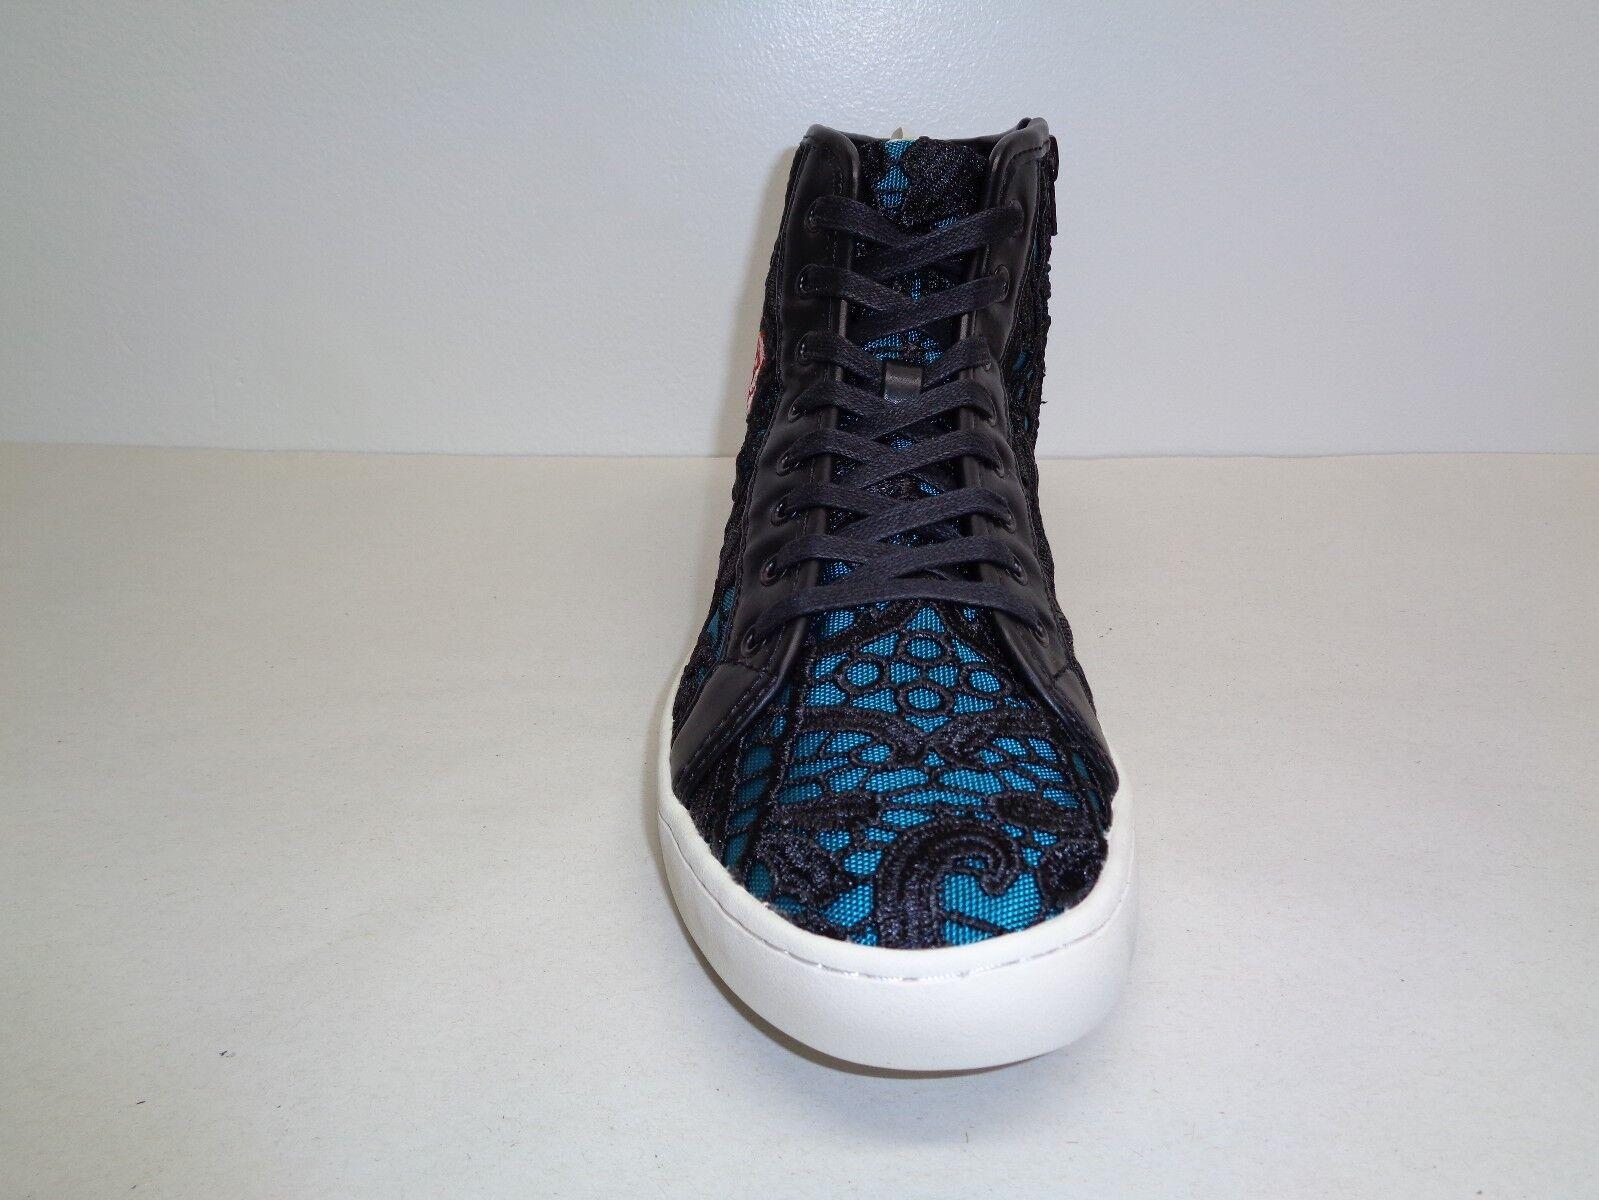 4693ca0af69 ... Steve Madden Size 8 M ASHBY Floral Black Fashion Fashion Fashion Hi Top Sneakers  New Mens ...